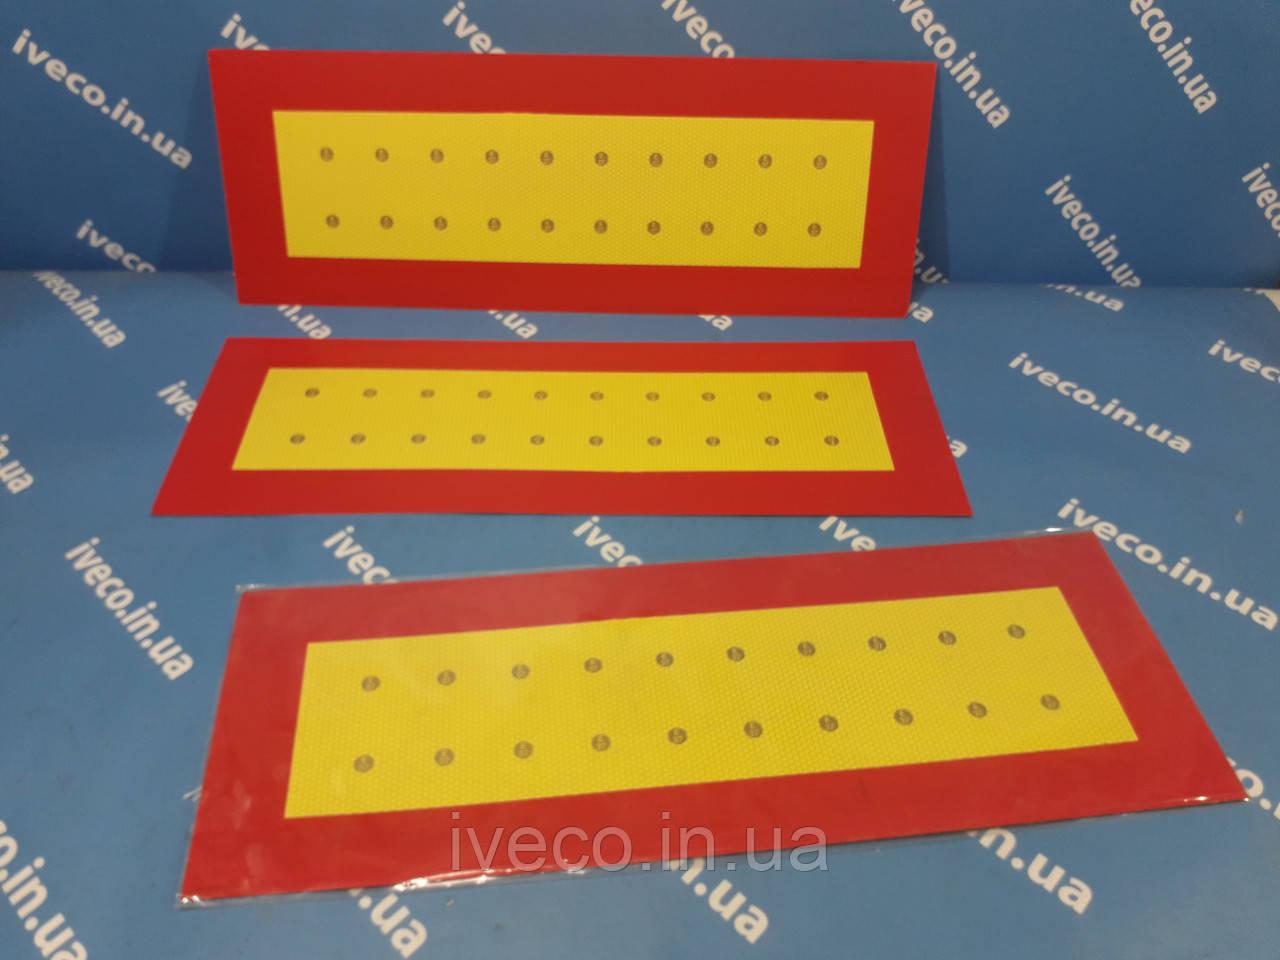 Знак длинномер 500х200 комплект 2ШТ комплект таблиц светоотражающих 2шт  табличка  MG35702